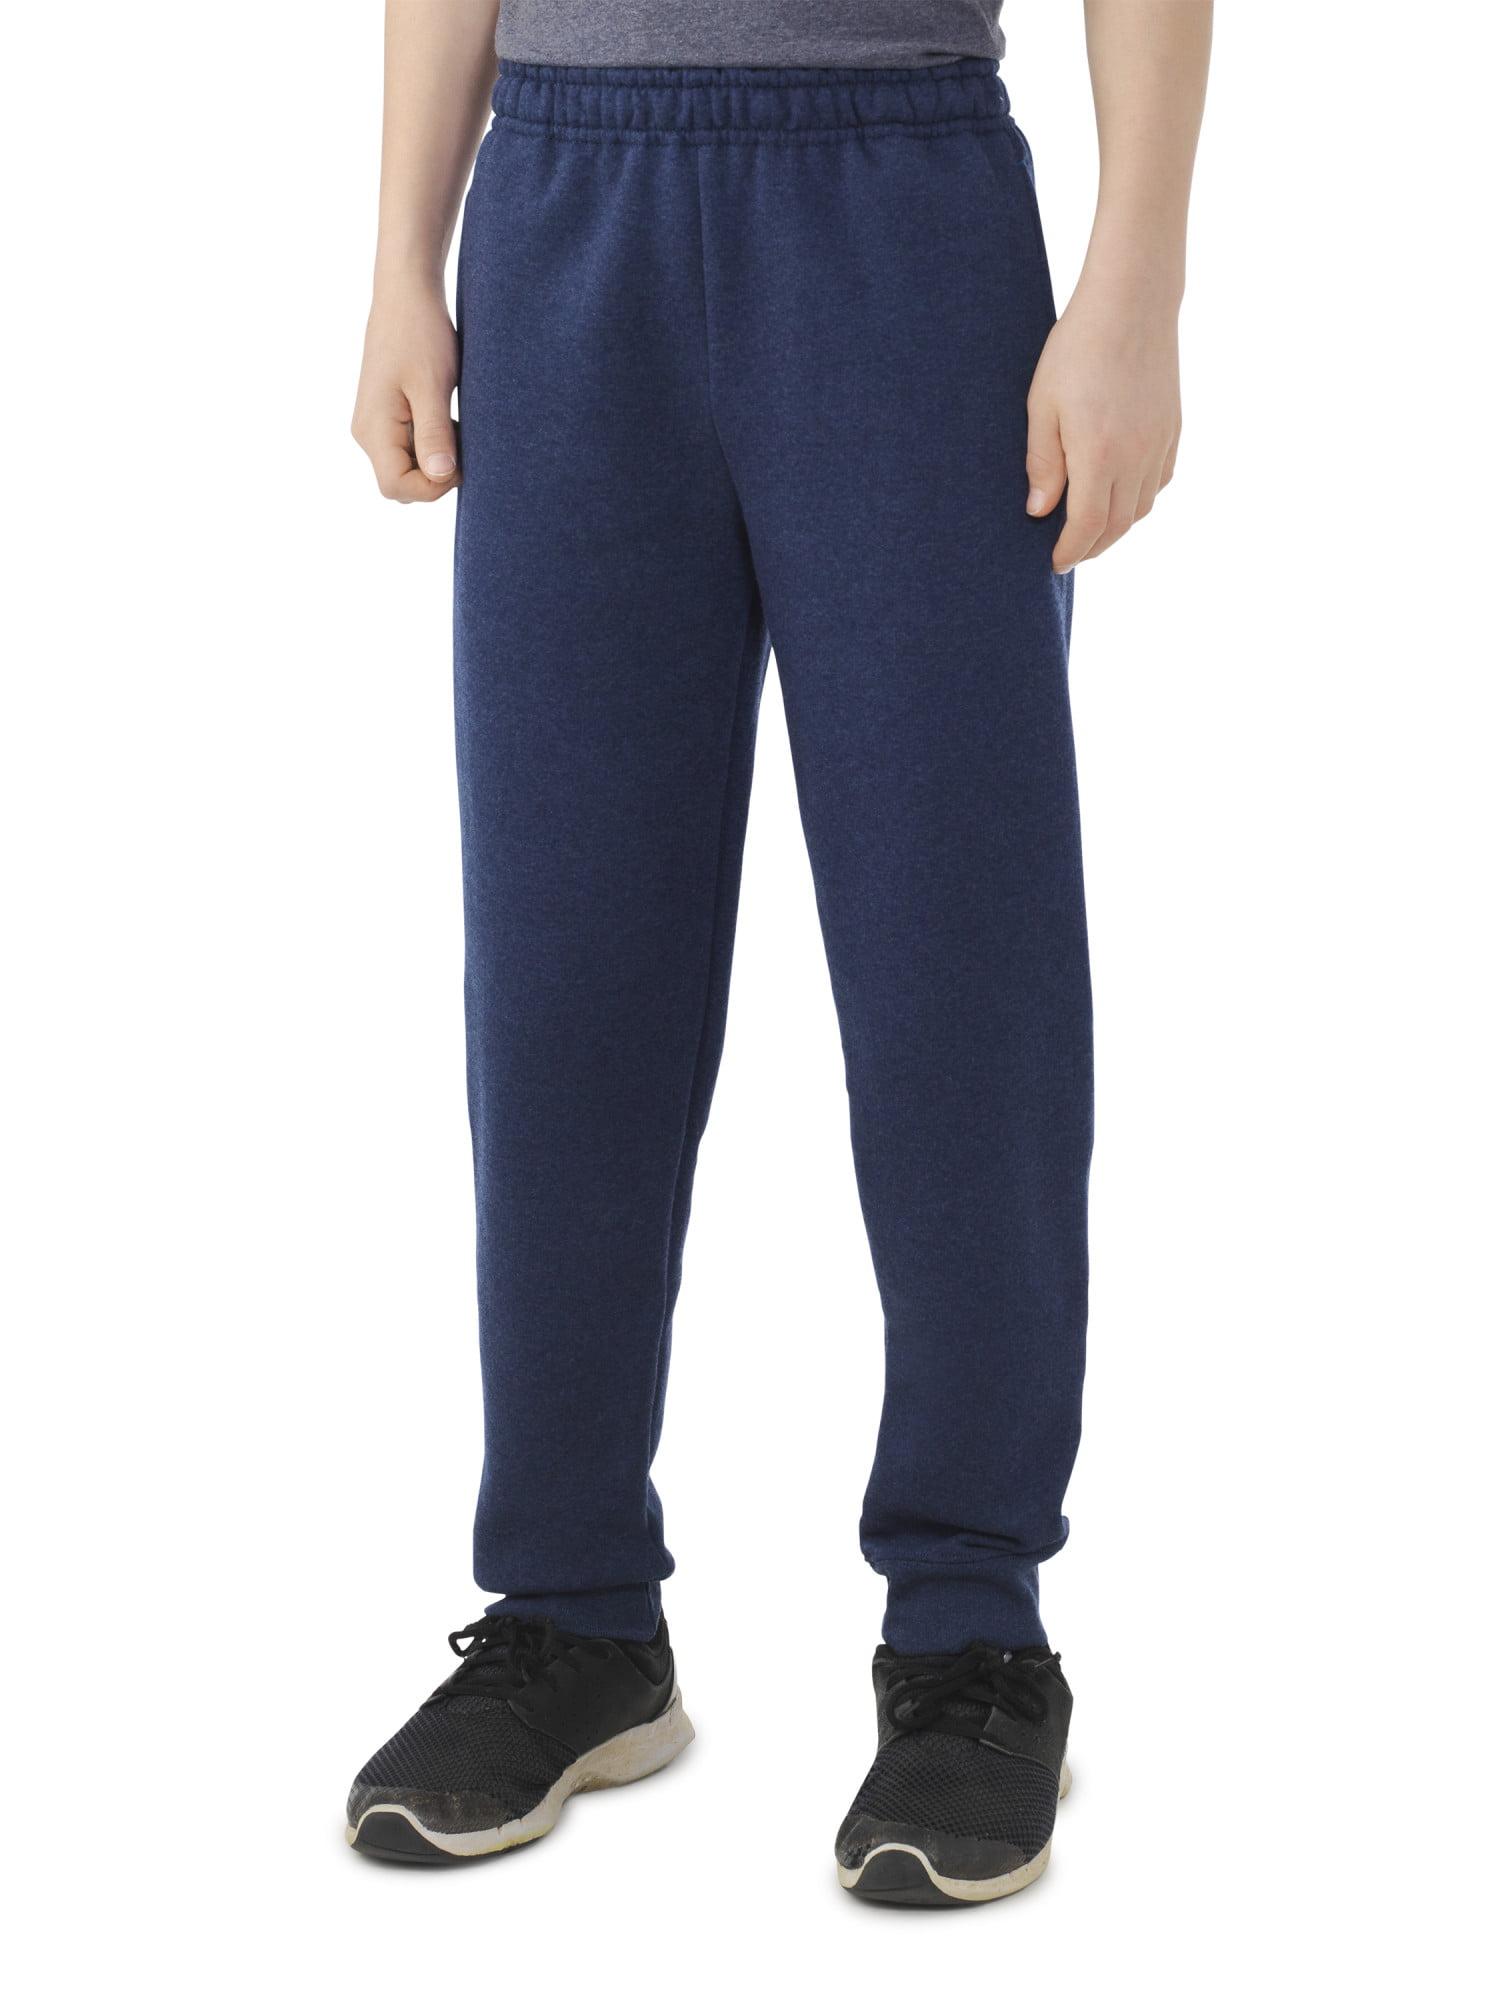 Boys' Explorer Fleece Super Soft Jogger Pant with Pocket Details